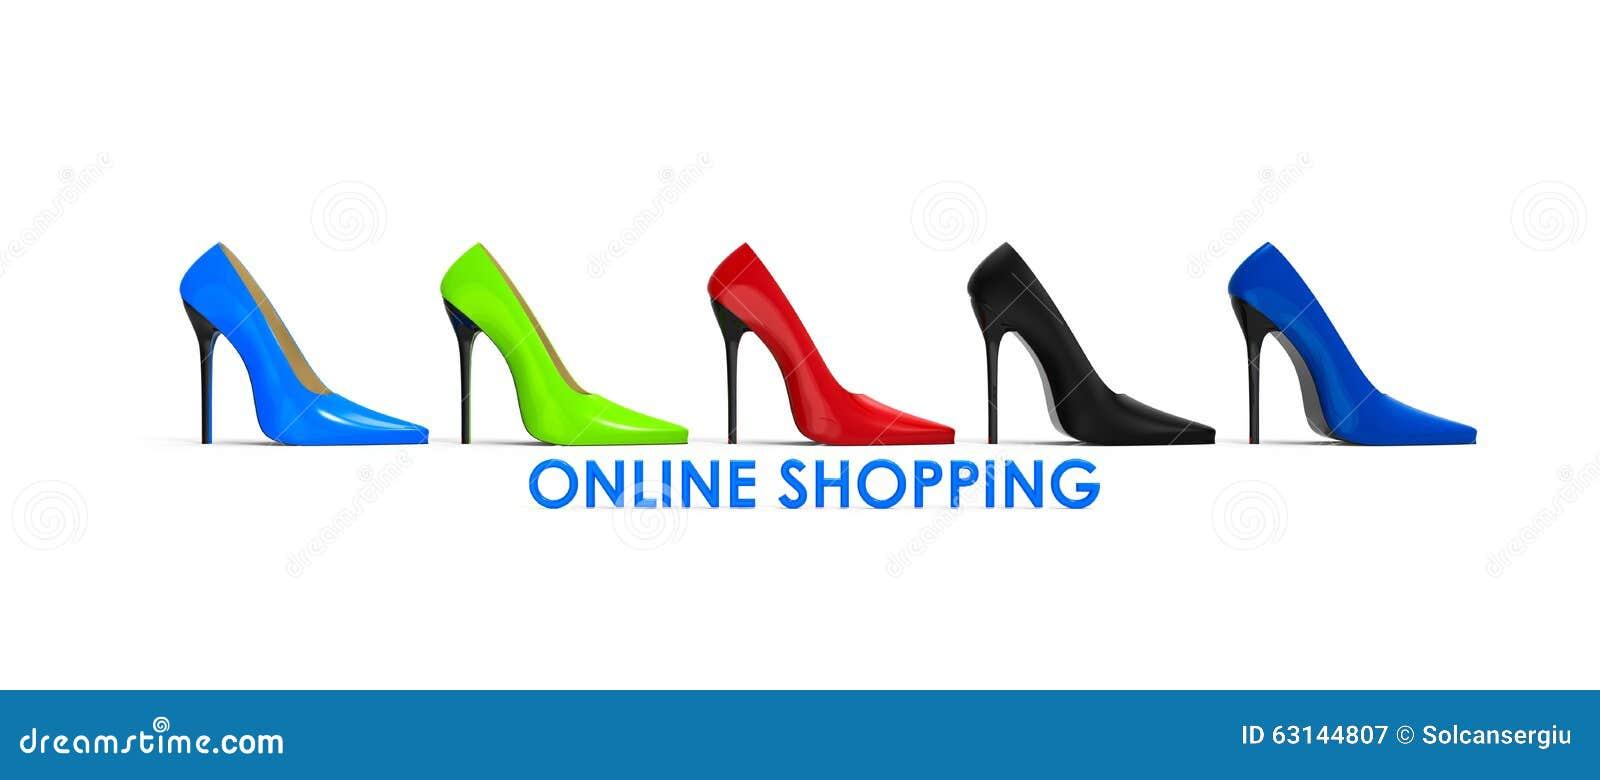 High times shop online